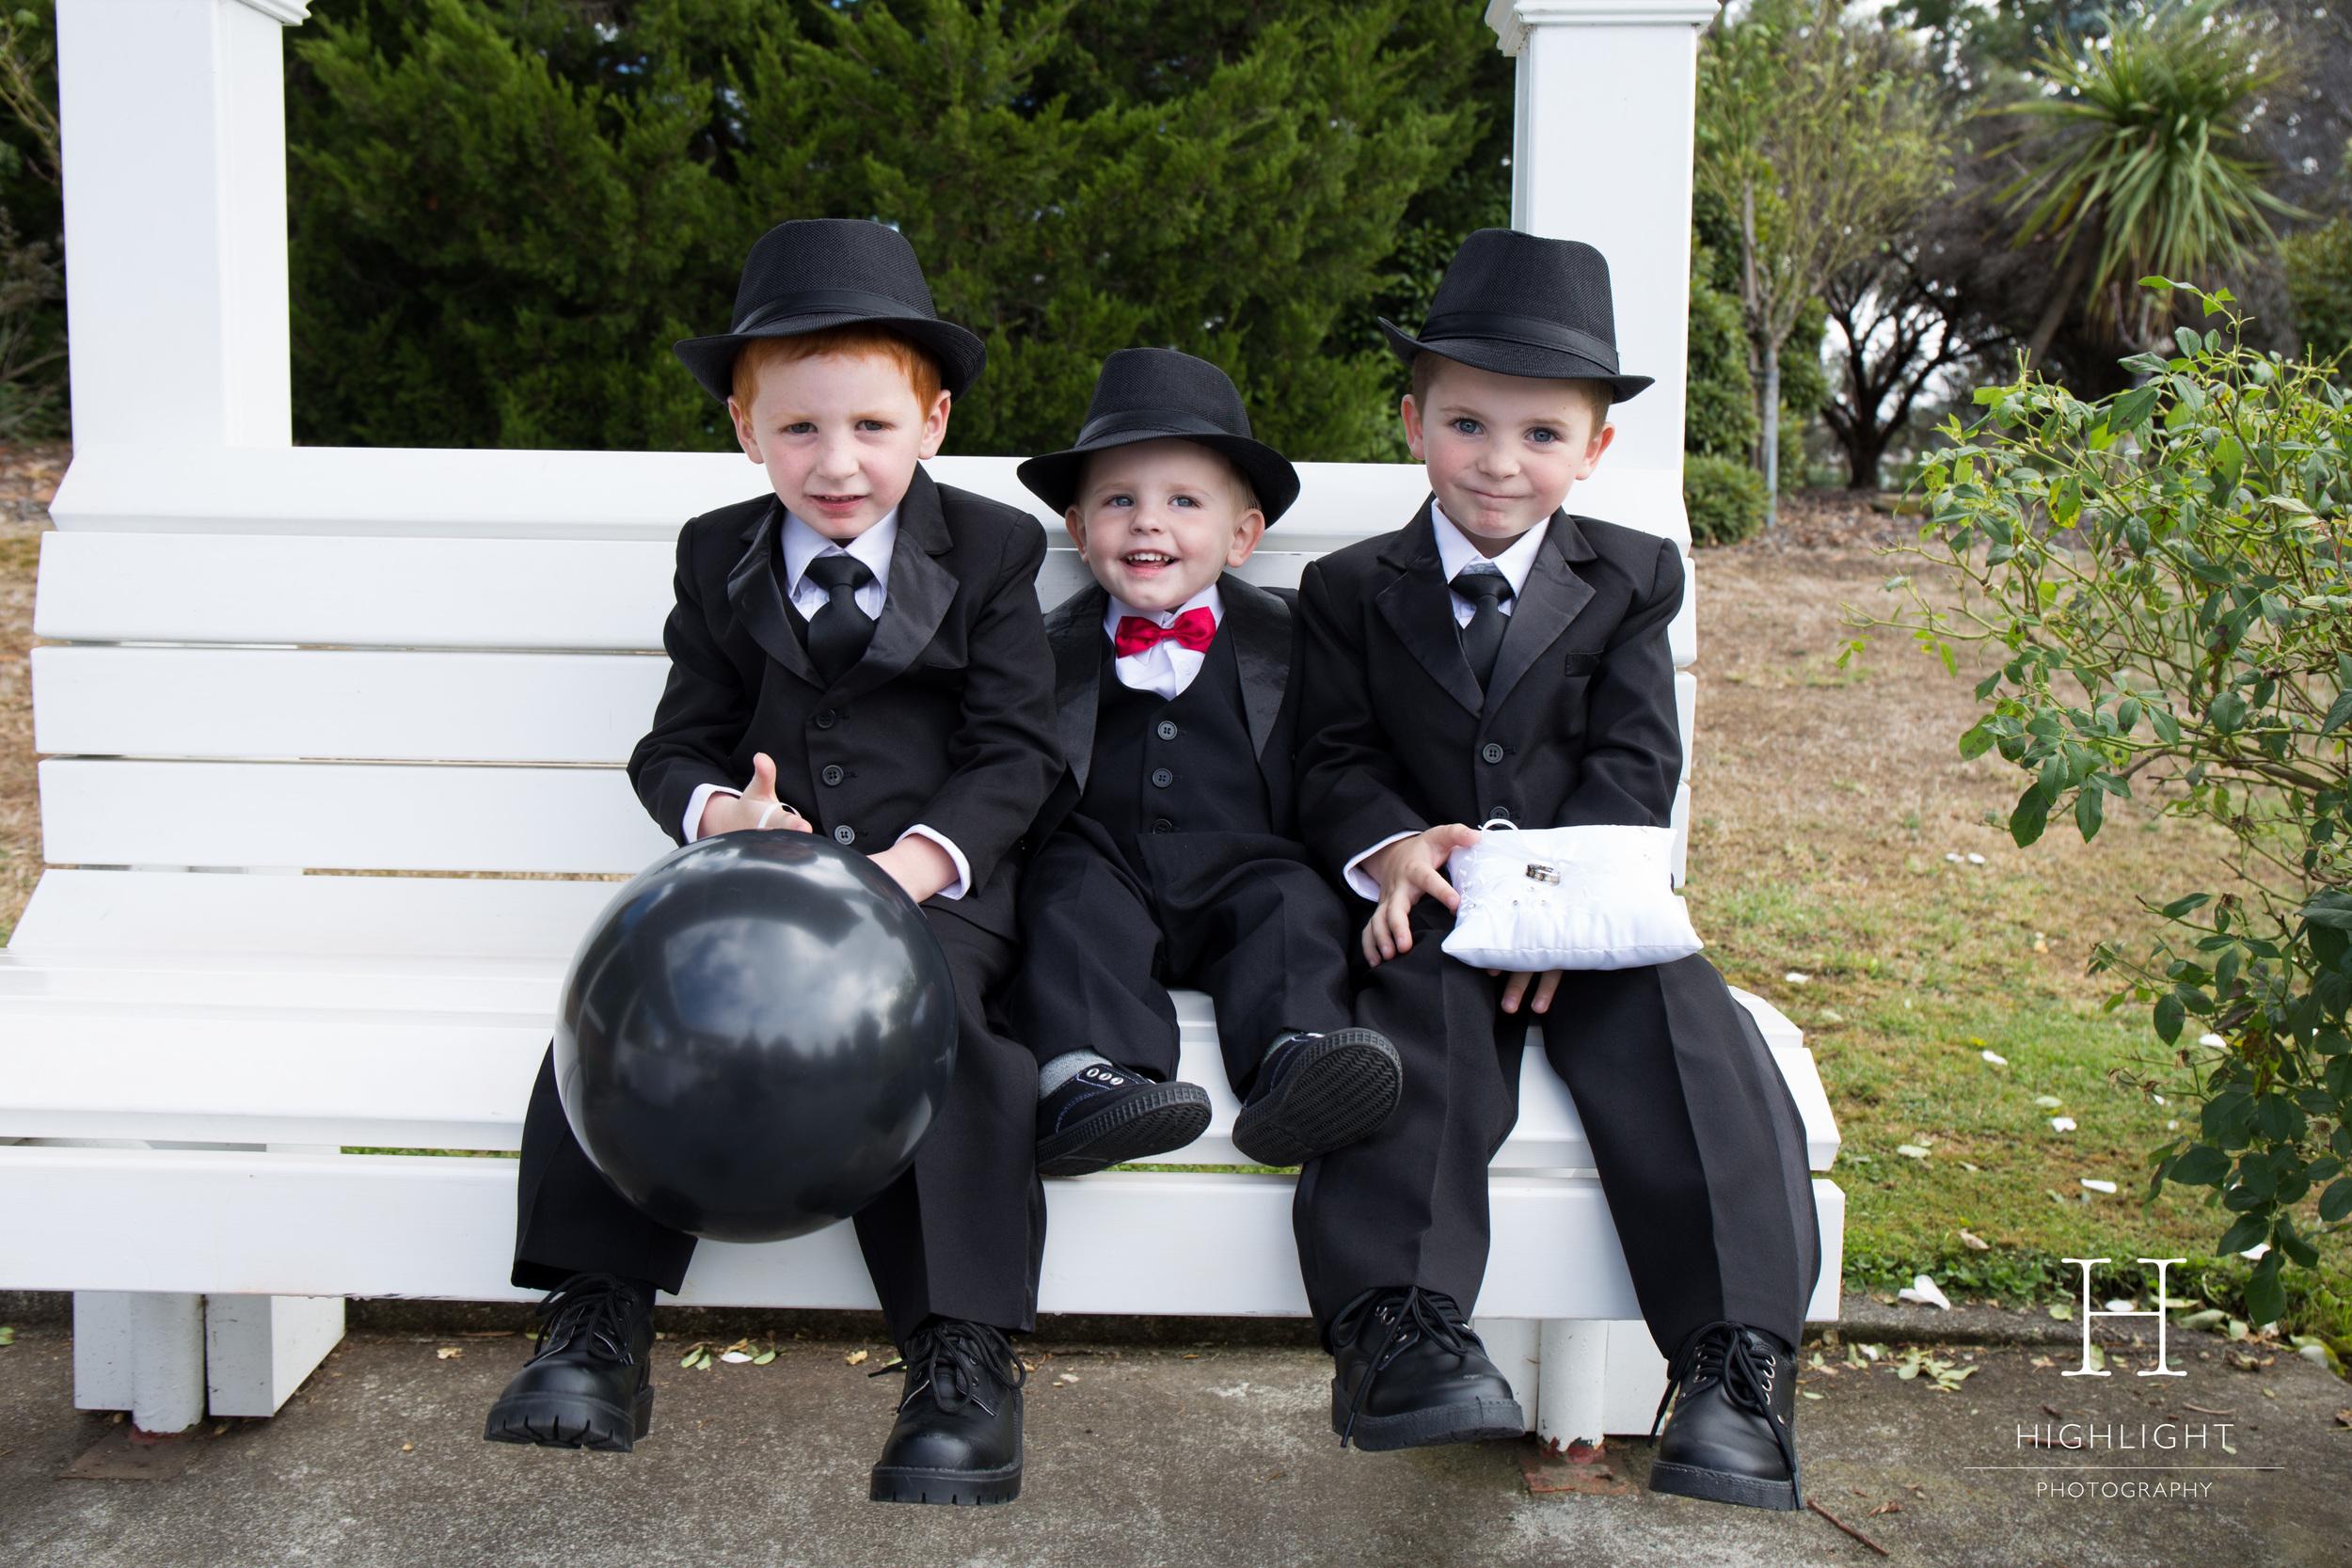 highlight_photography_wedding_new_zealand_boys.jpg